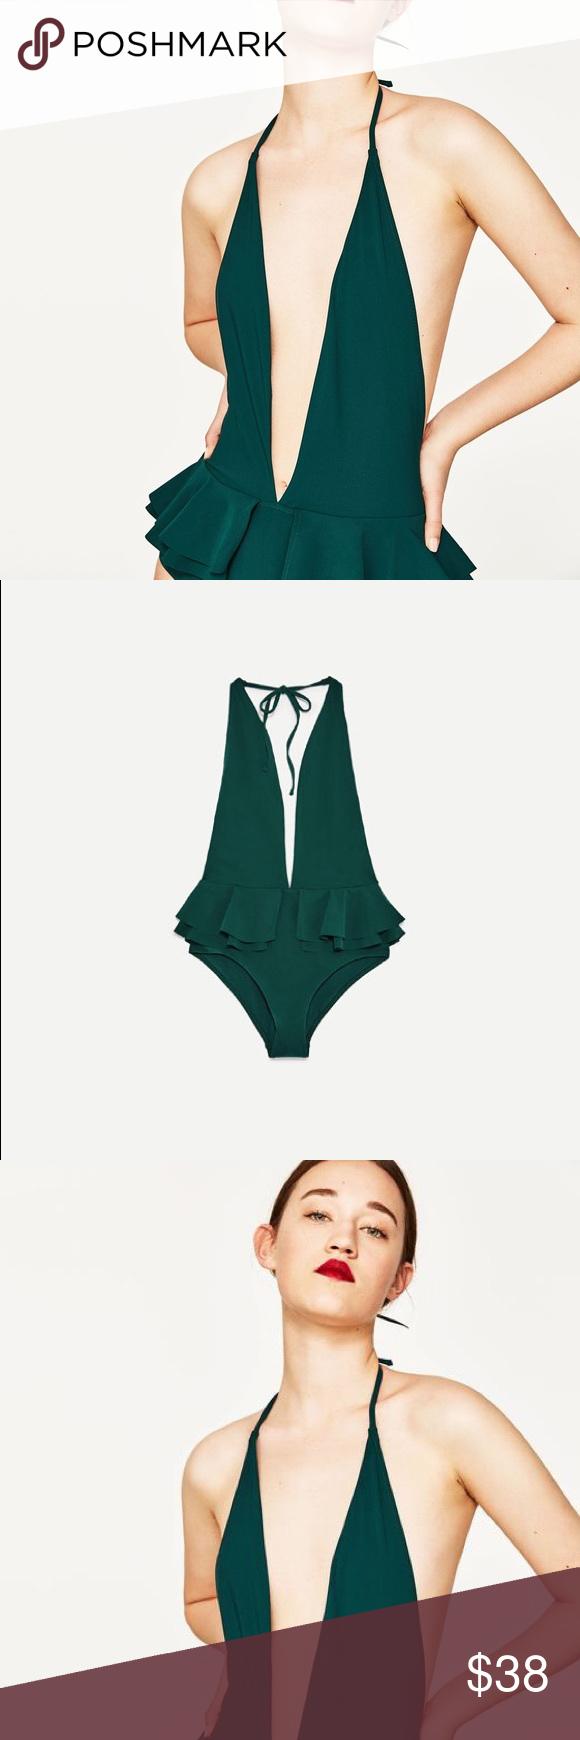 68e56275d12 NWT Zara Hunter Green Halter Neck Peplum One Piece Stunning ruffled waist  peplum bathing suit with low cut v neck and Halter neckline.